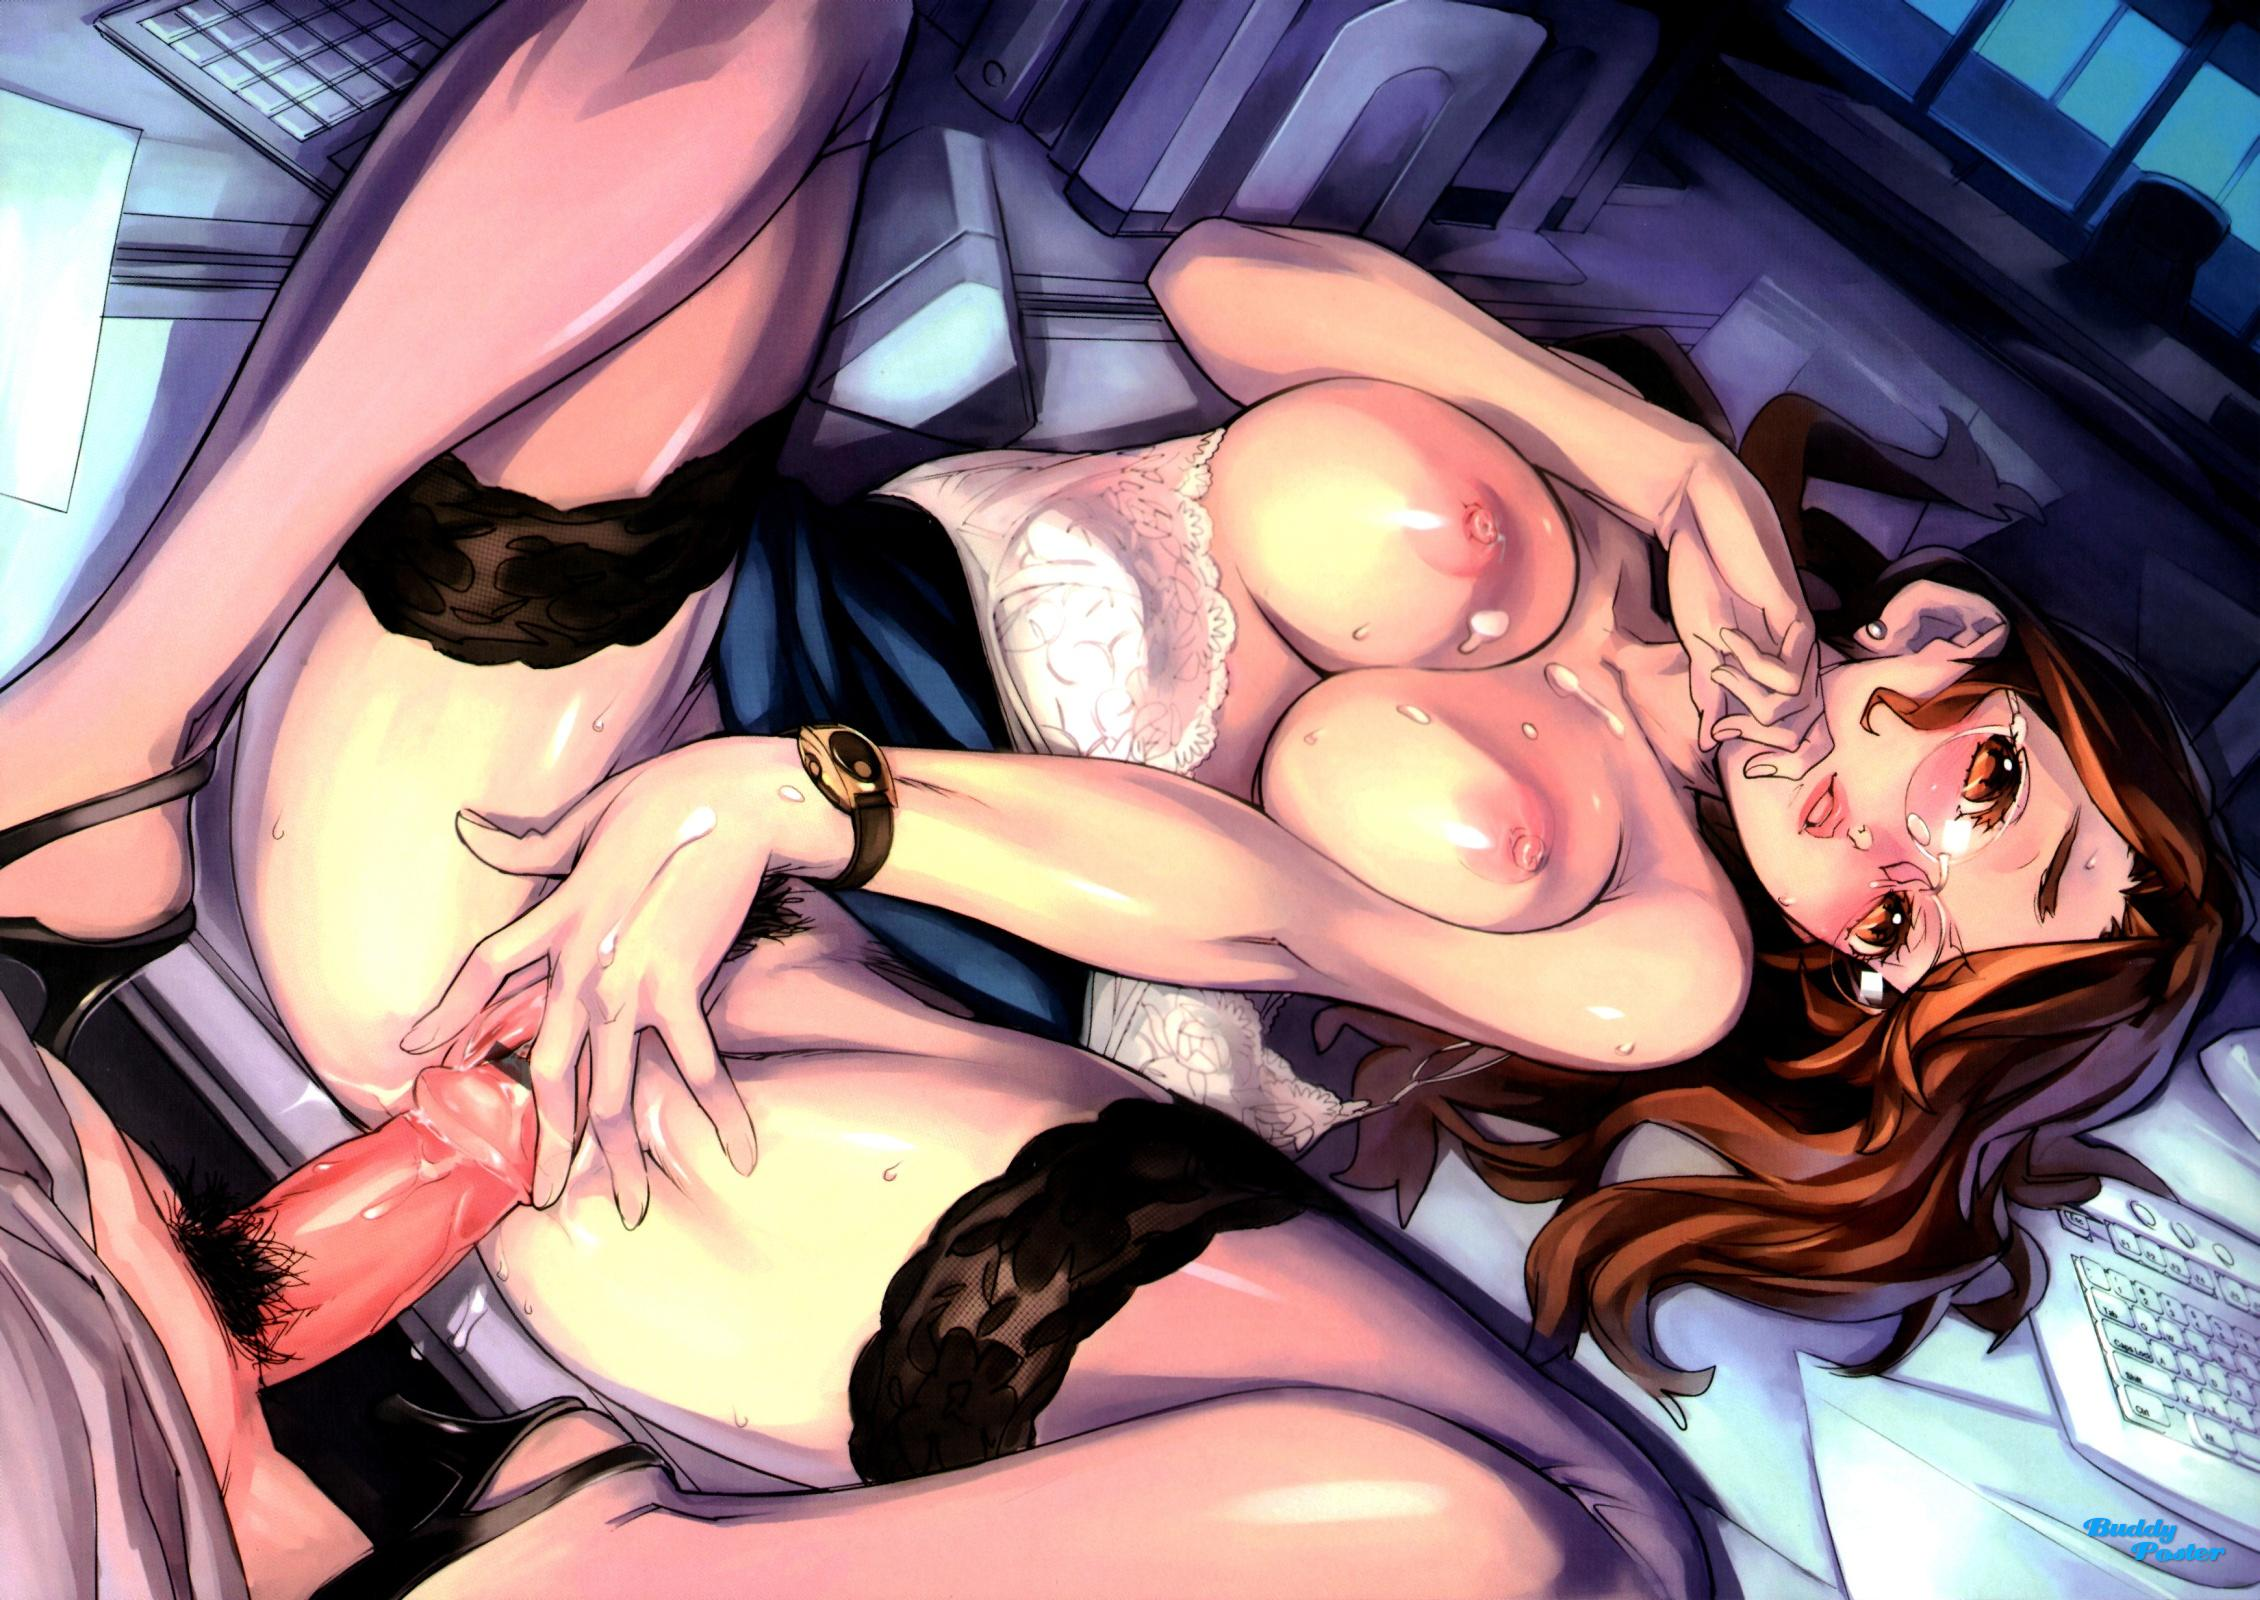 Free hentai sex uncensored porn pics and hentai sex